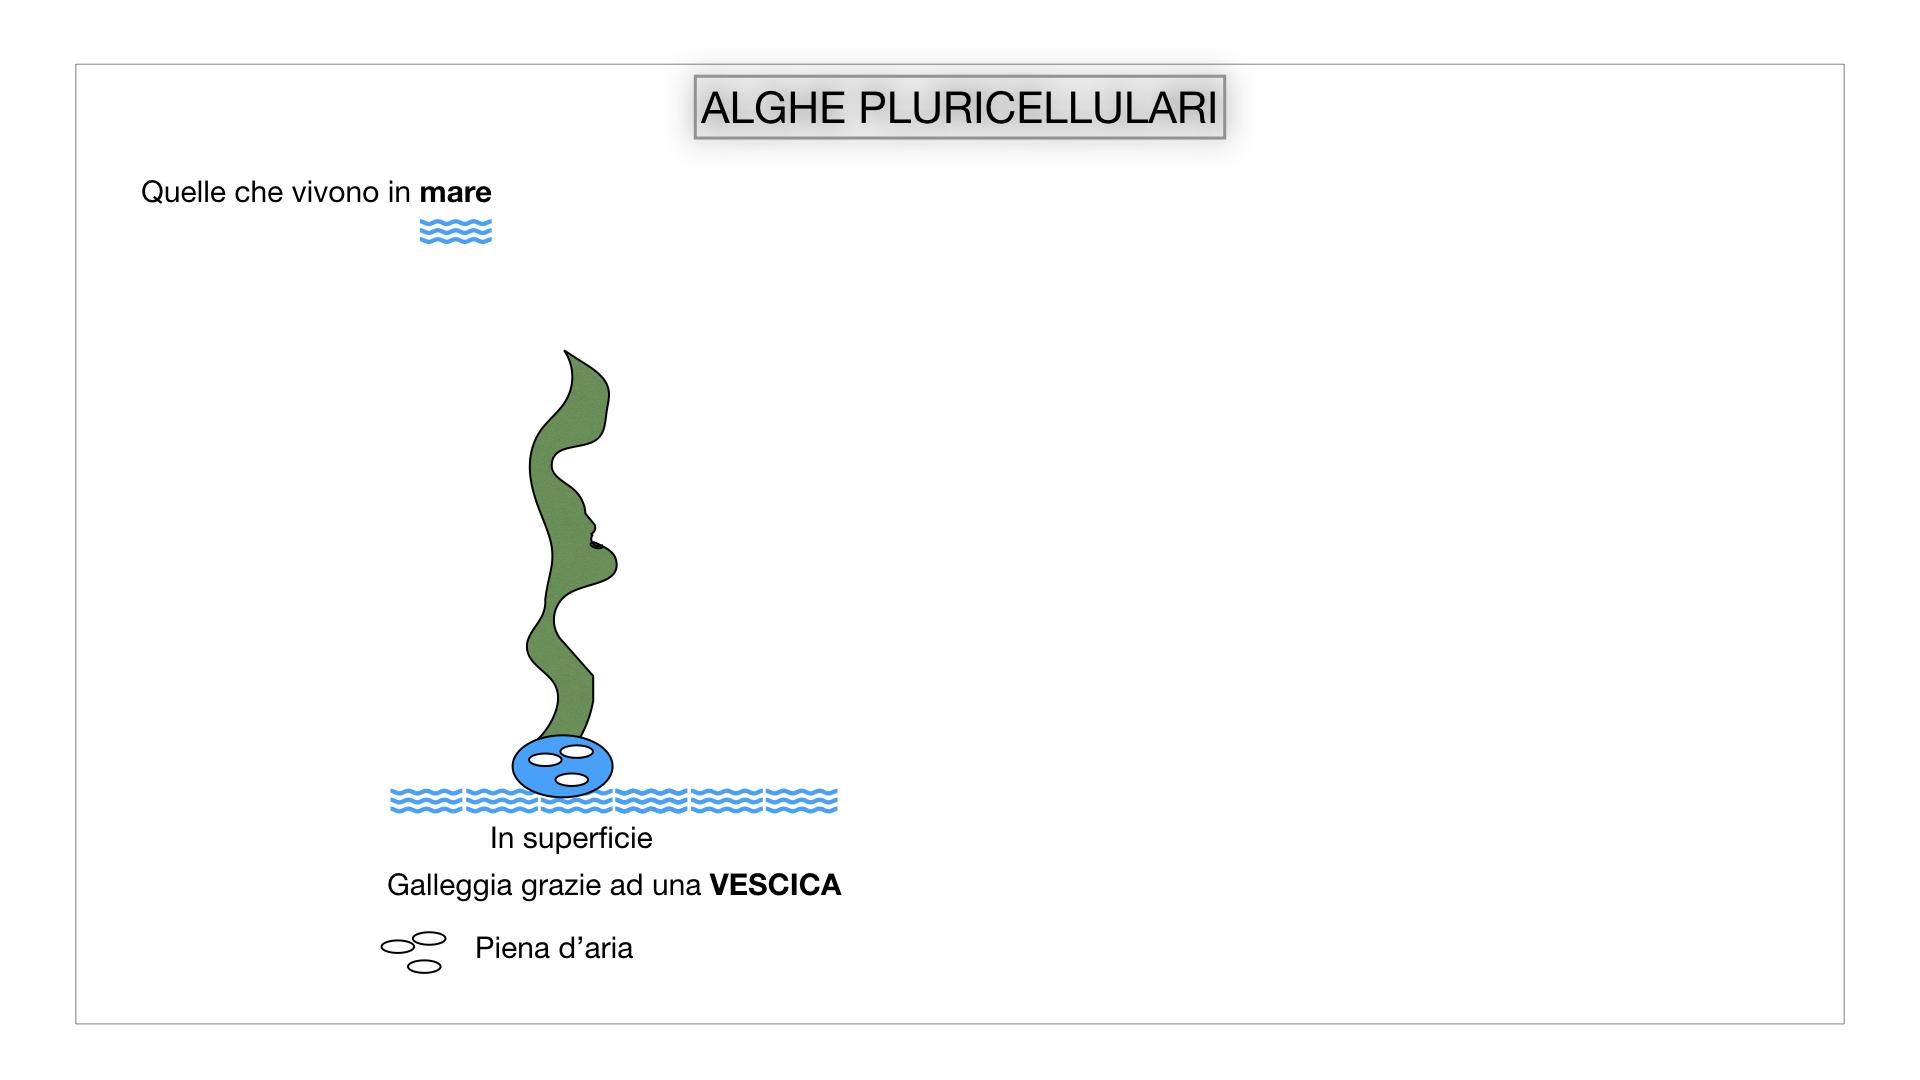 8. alghe uni_pluri_cellulari_SIMULAZIONE.034